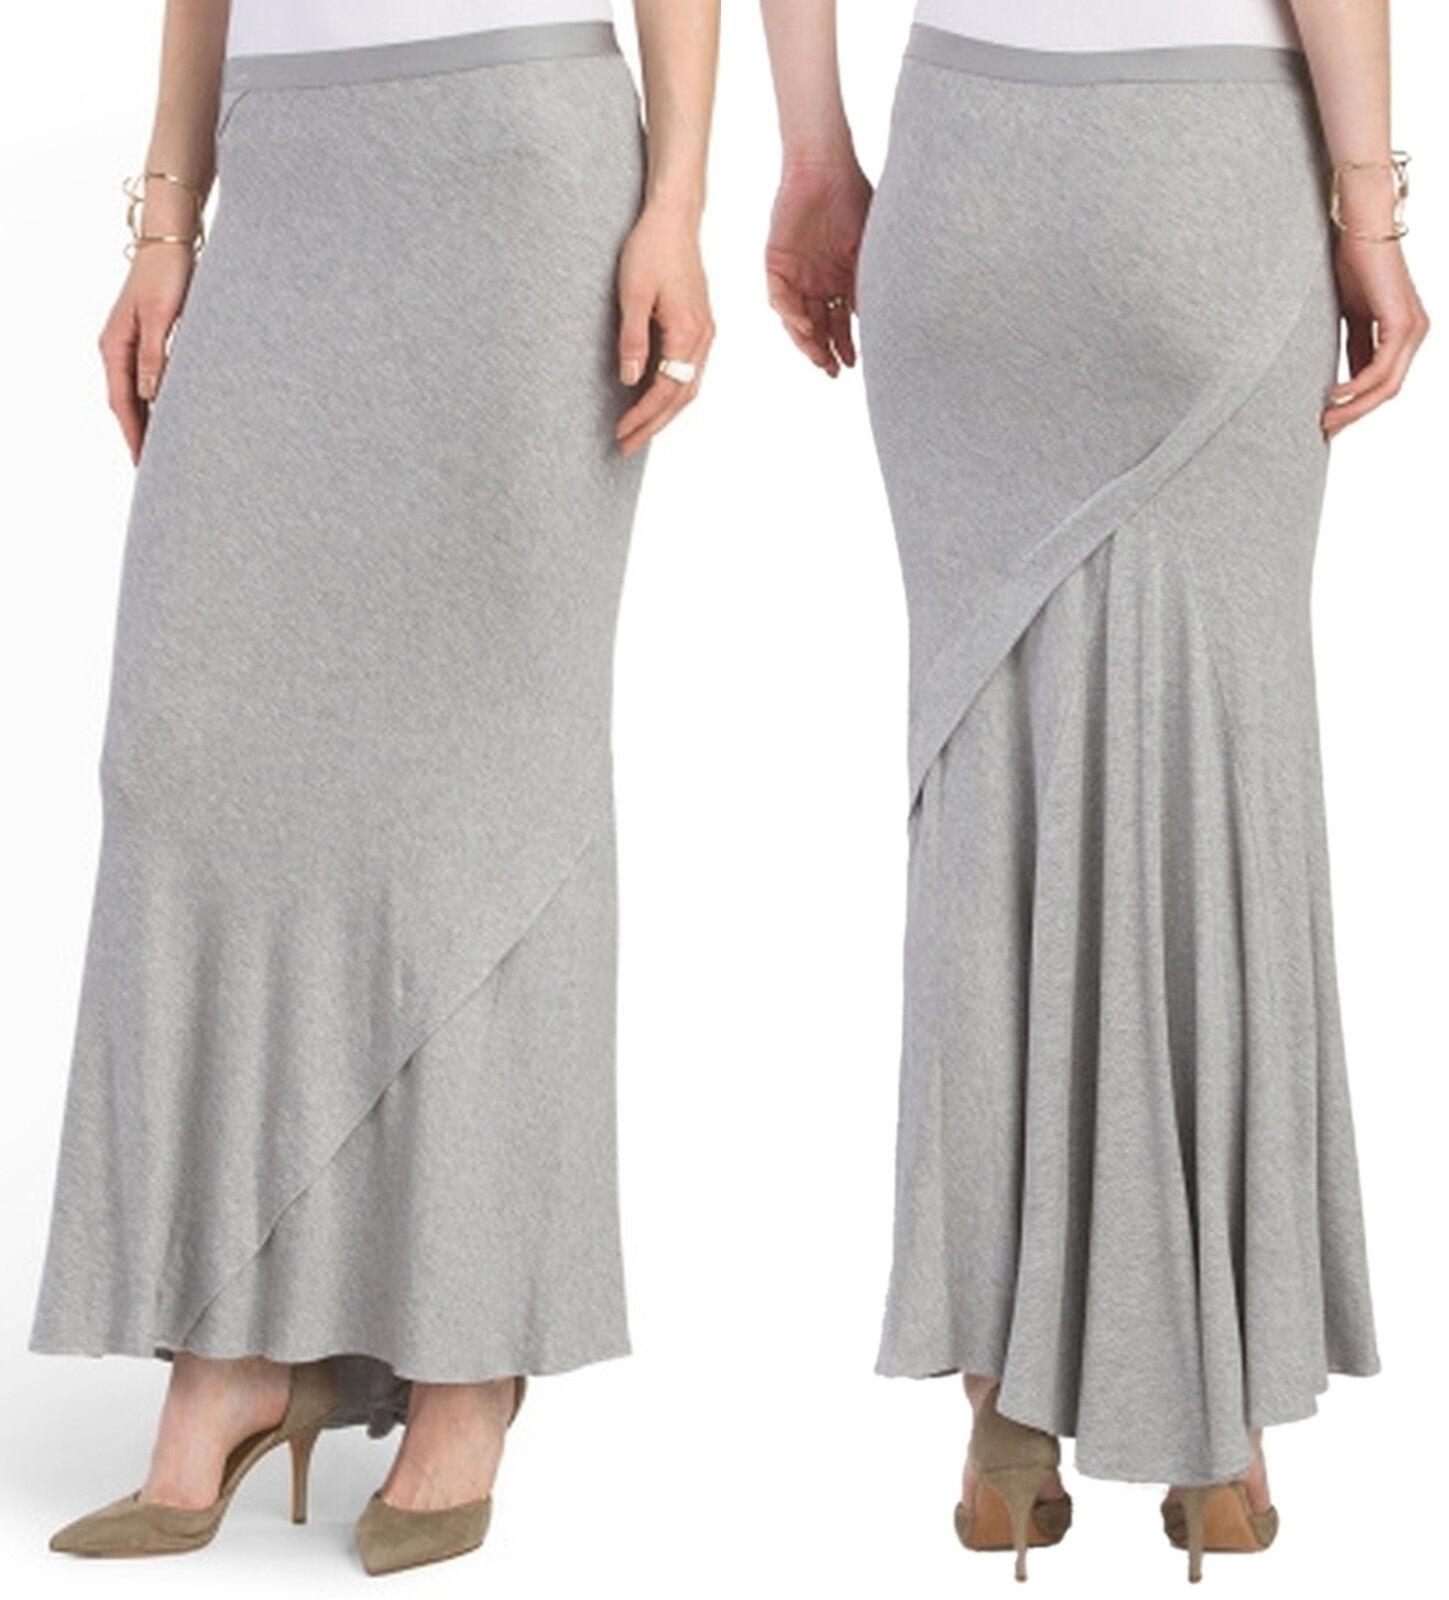 NWT Haute Hippie Marianne Jersey Maxi Skirt Size M